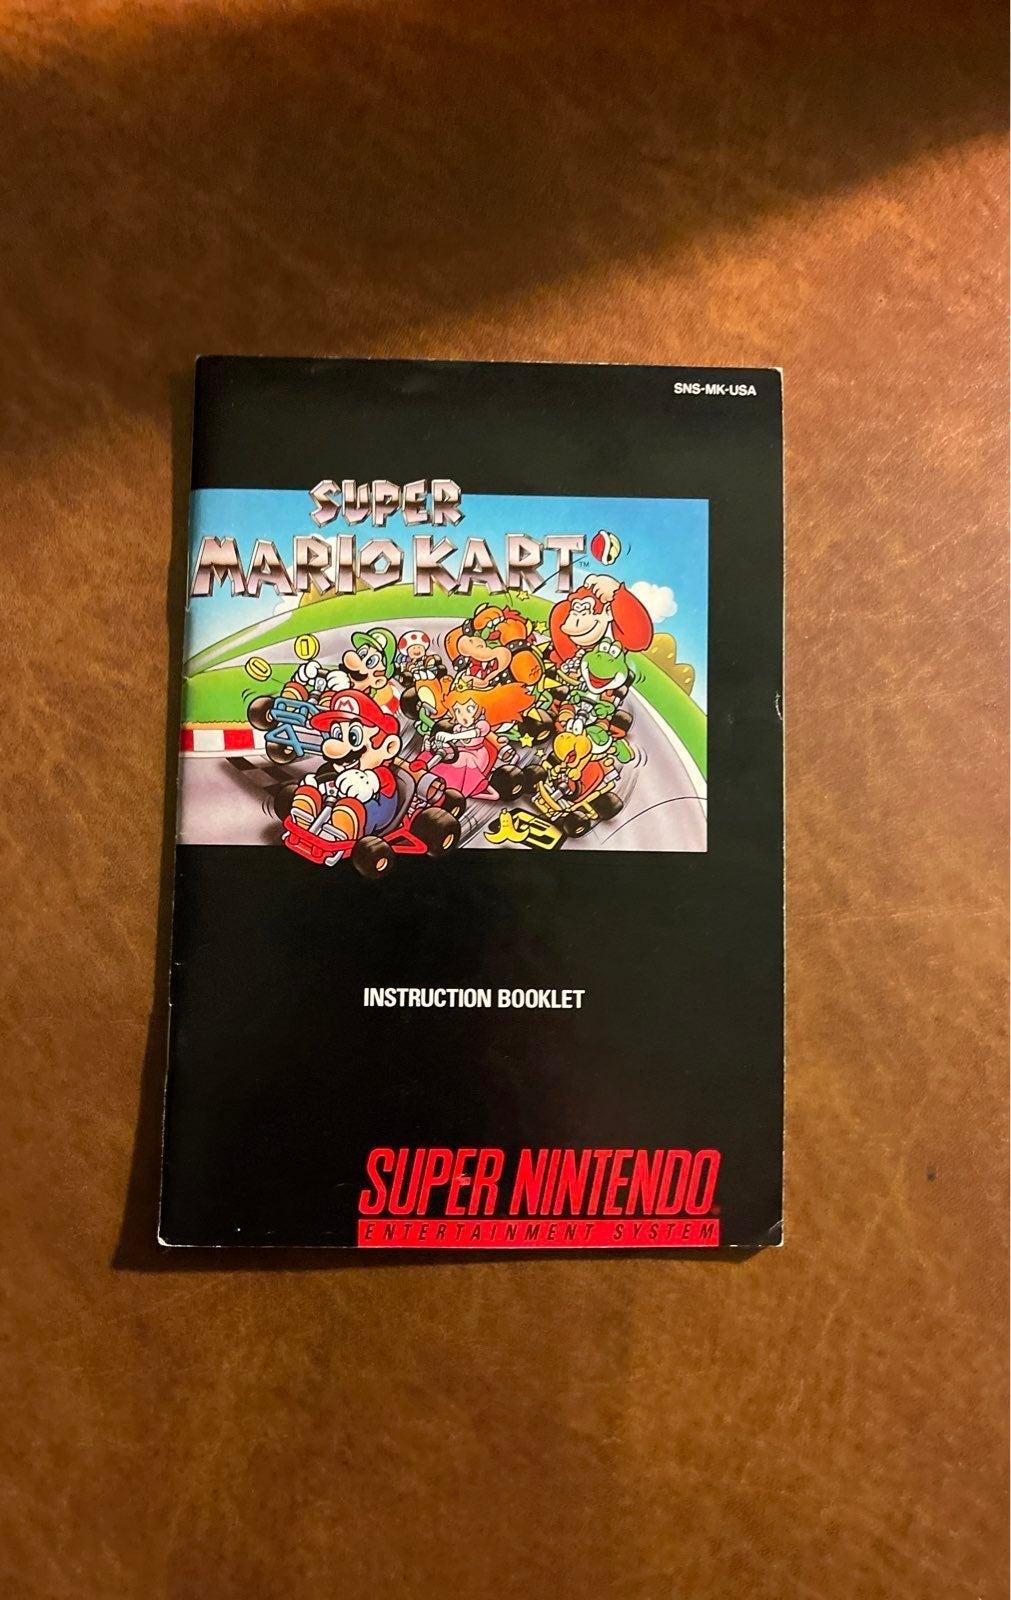 Super Mario Kart instruction manual